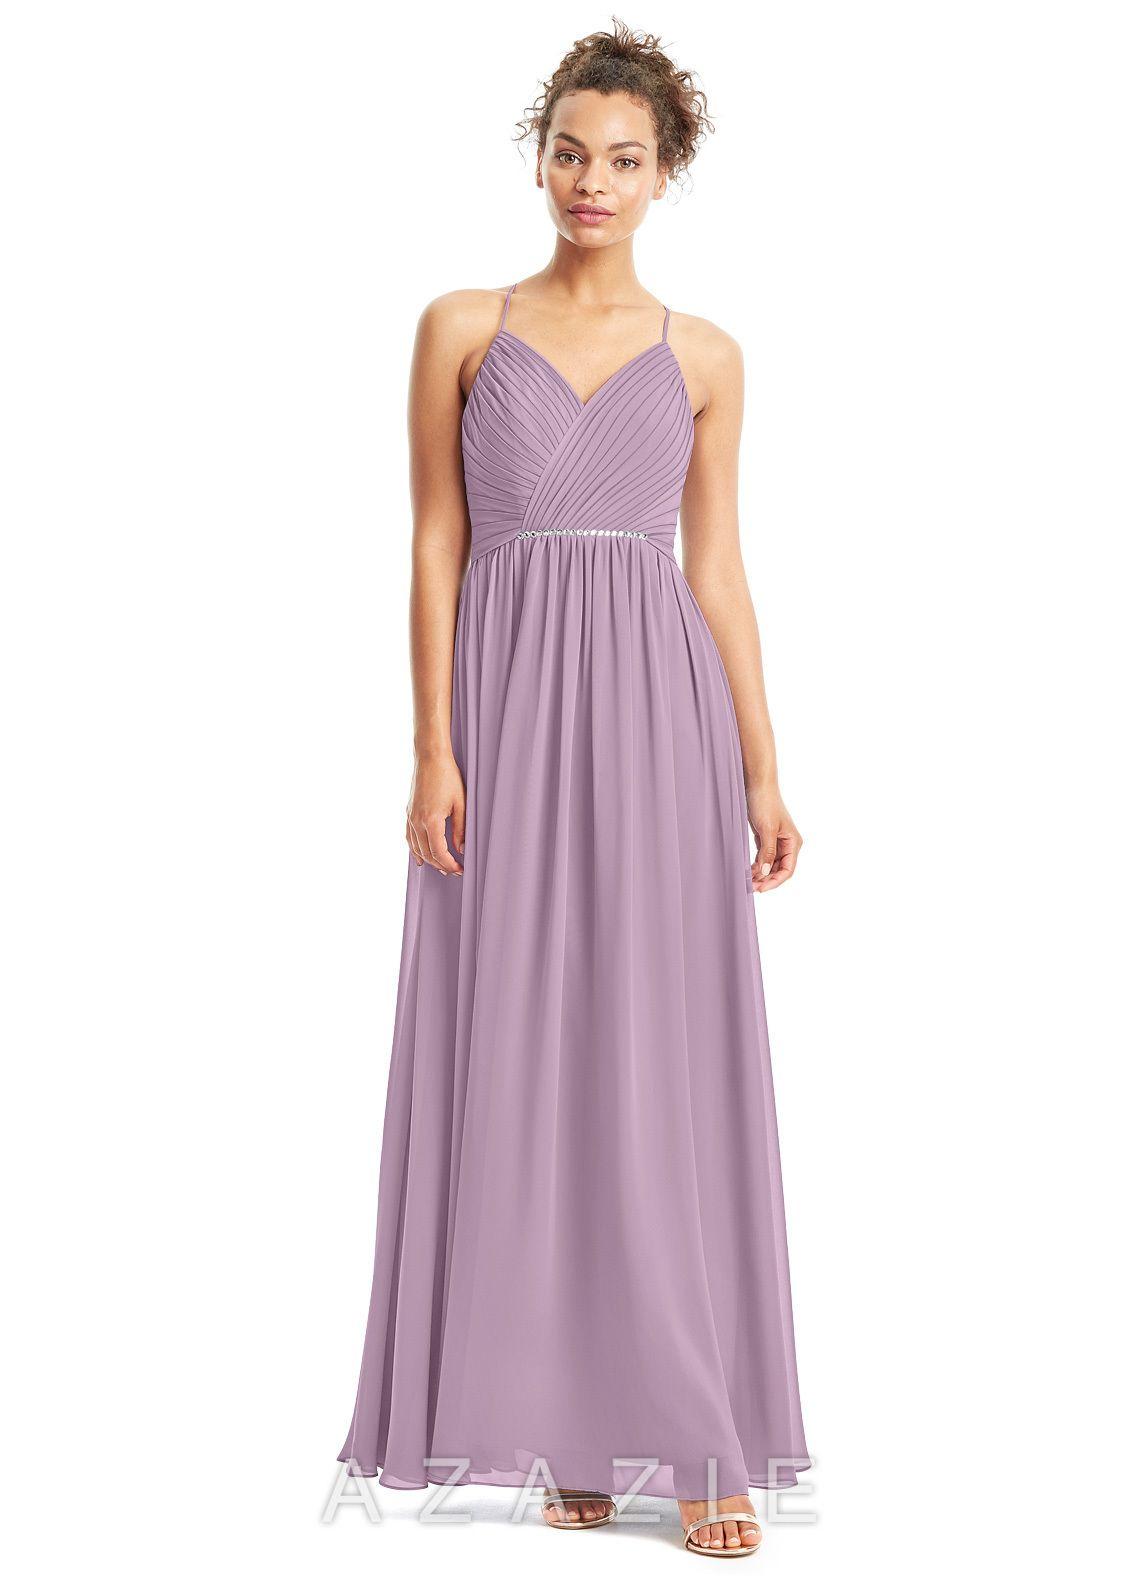 6a7f5aebaaf Azazie Donna Bridesmaid Dress - Wisteria